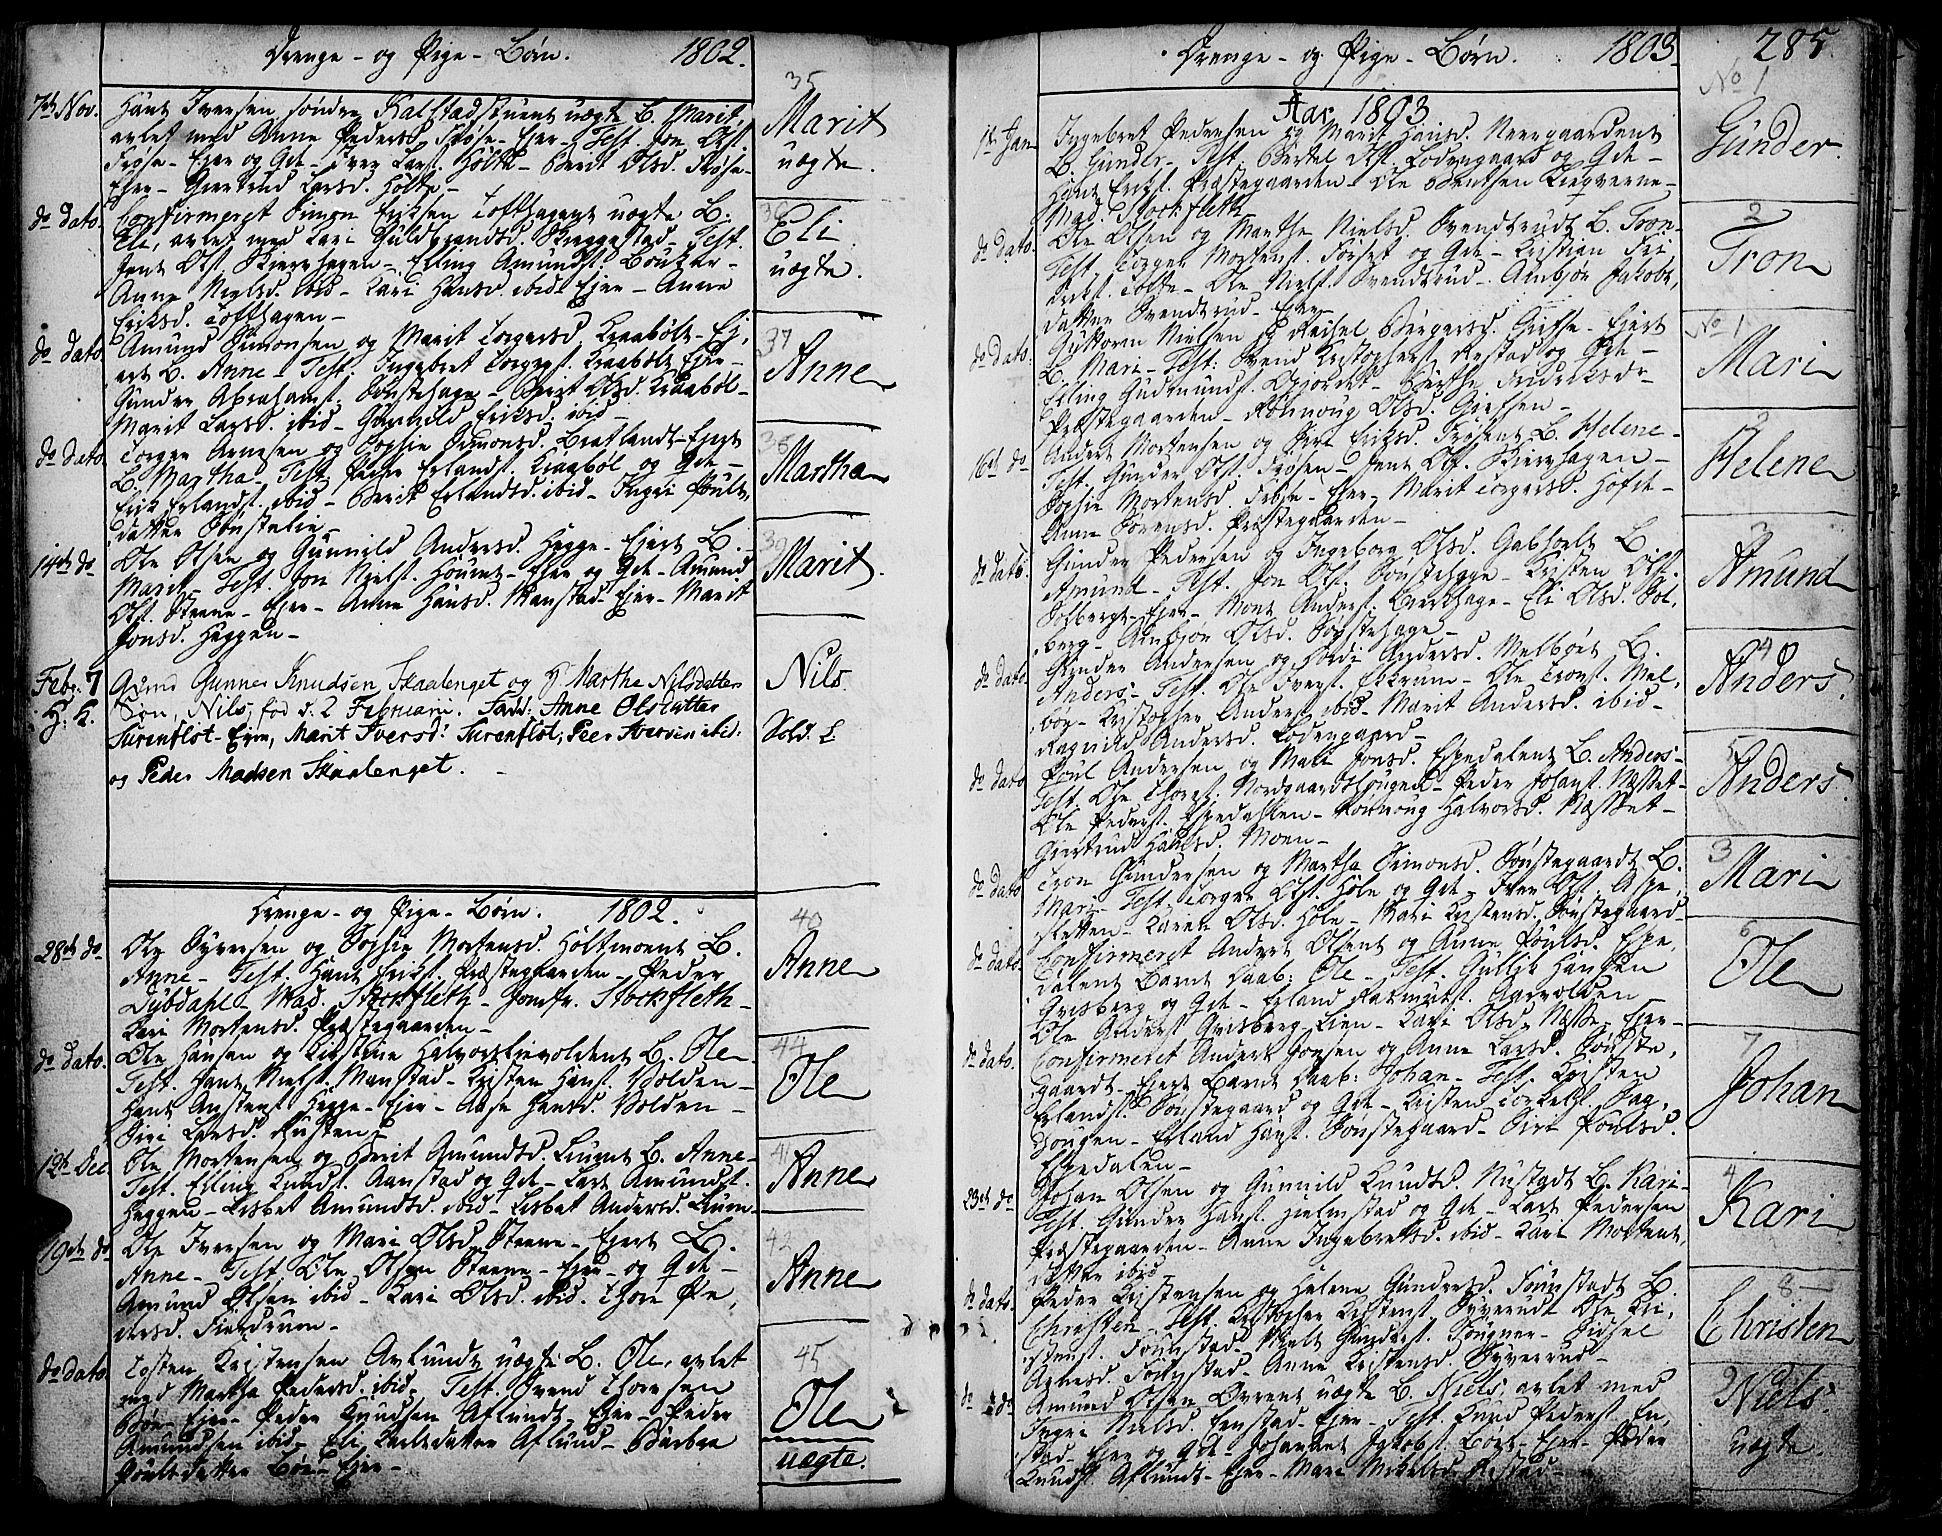 SAH, Gausdal prestekontor, Ministerialbok nr. 3, 1758-1809, s. 285